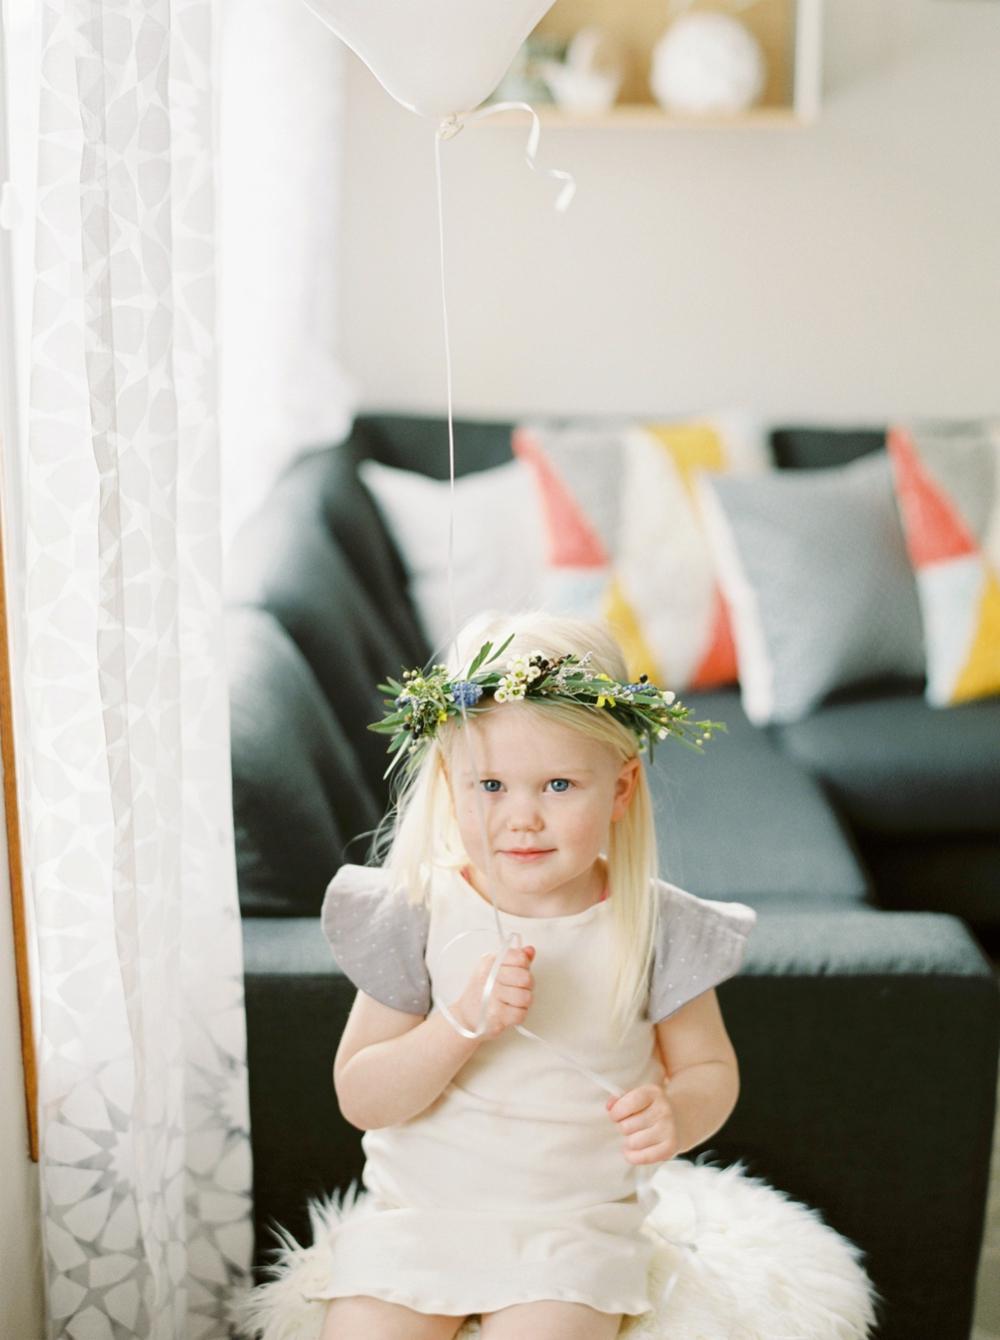 Calgary family photographers | fine art film photography | children photographer | Unicorn toys